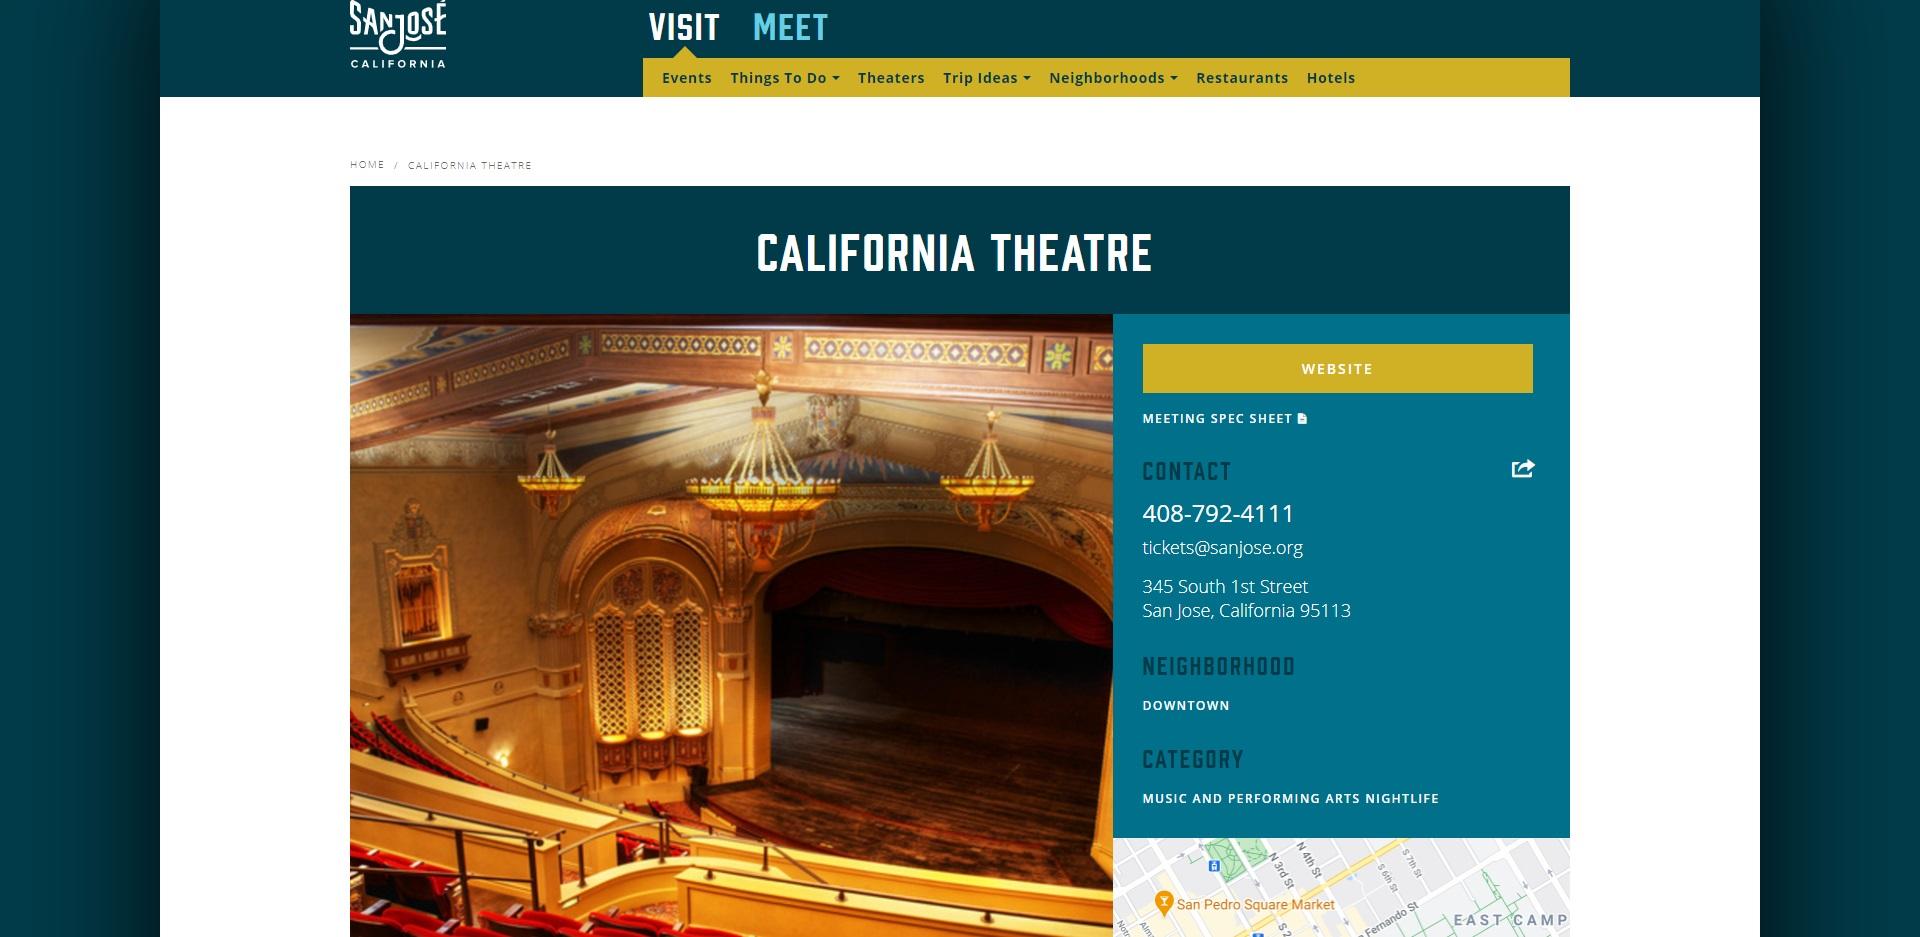 Best Theatres in San Jose